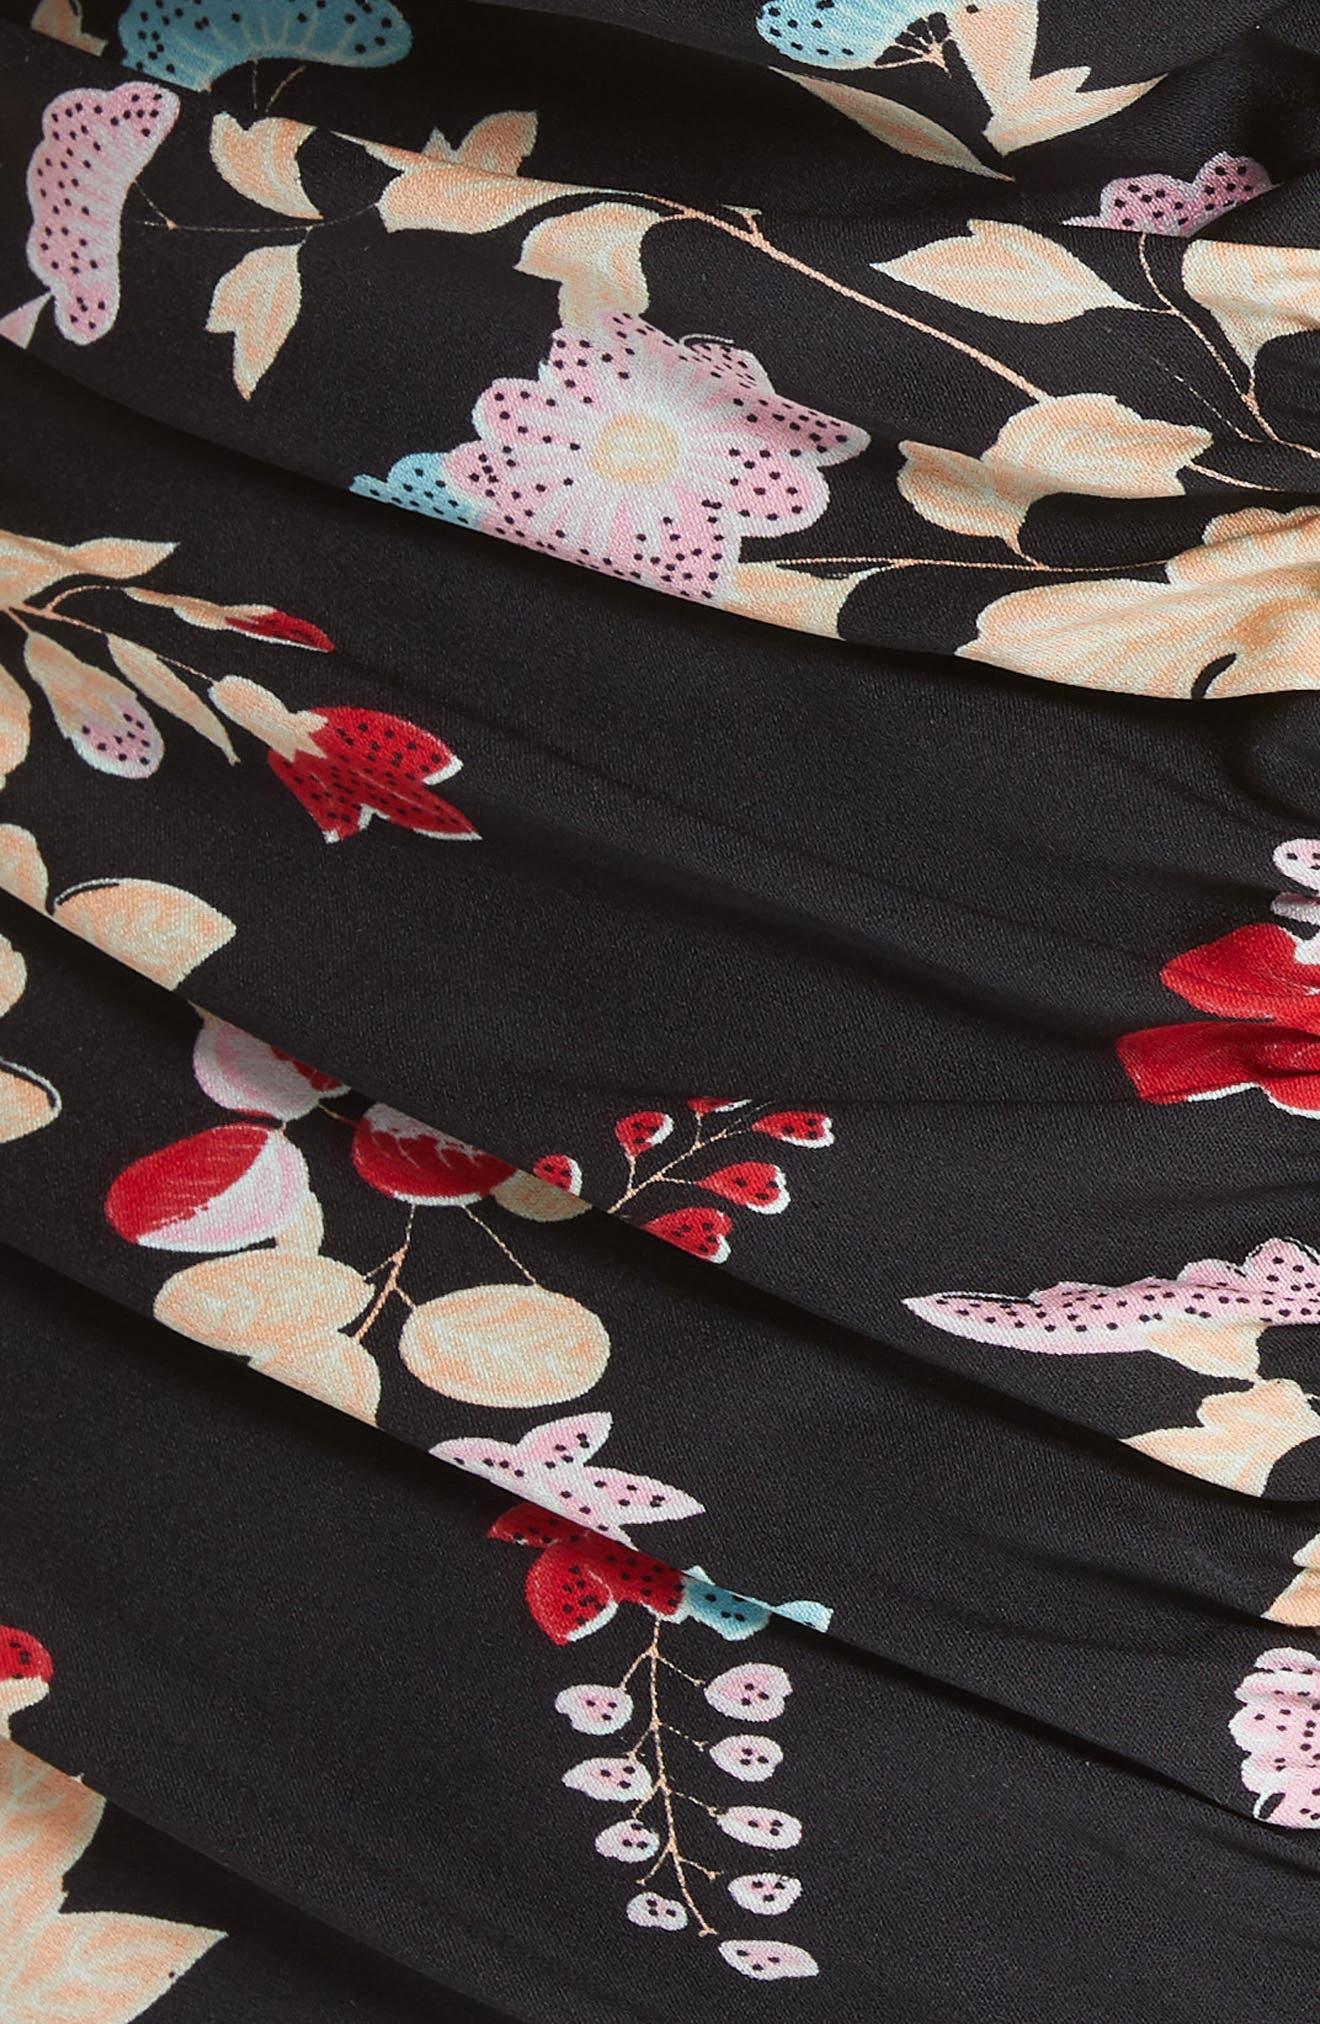 Diane von Furstenberg Sleeveless Ruched Floral Stretch Silk Bodysuit,                             Alternate thumbnail 5, color,